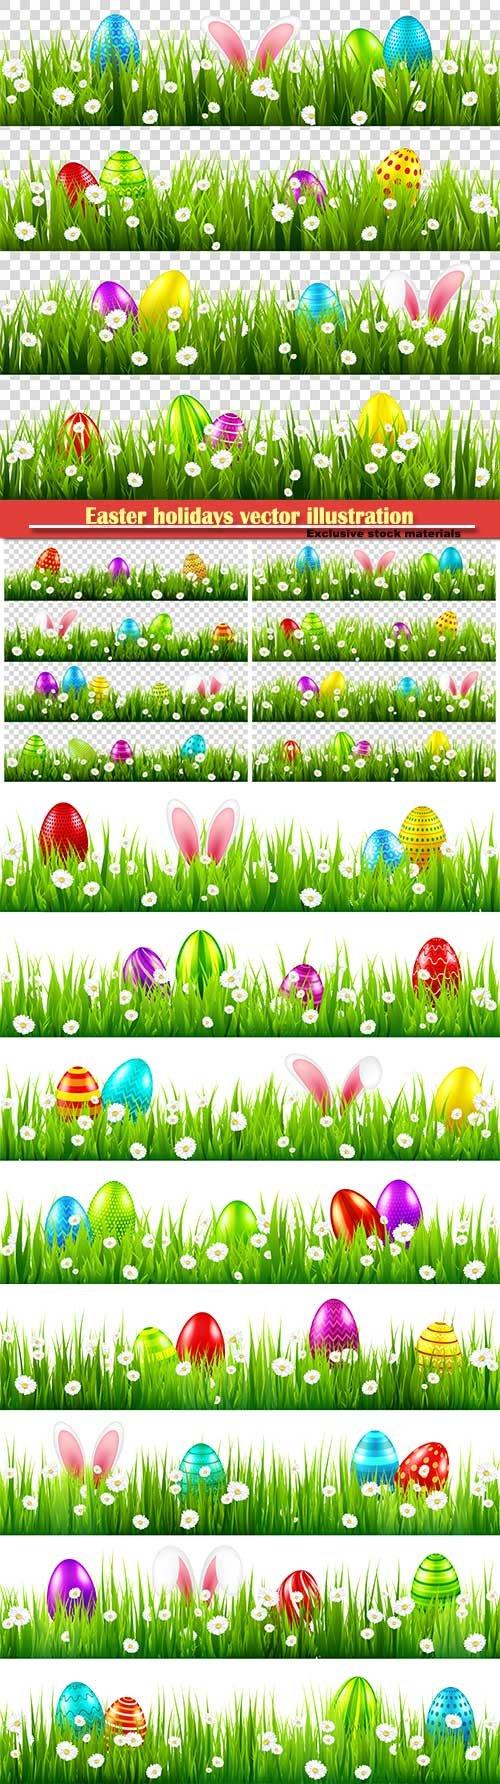 Easter holidays vector illustration